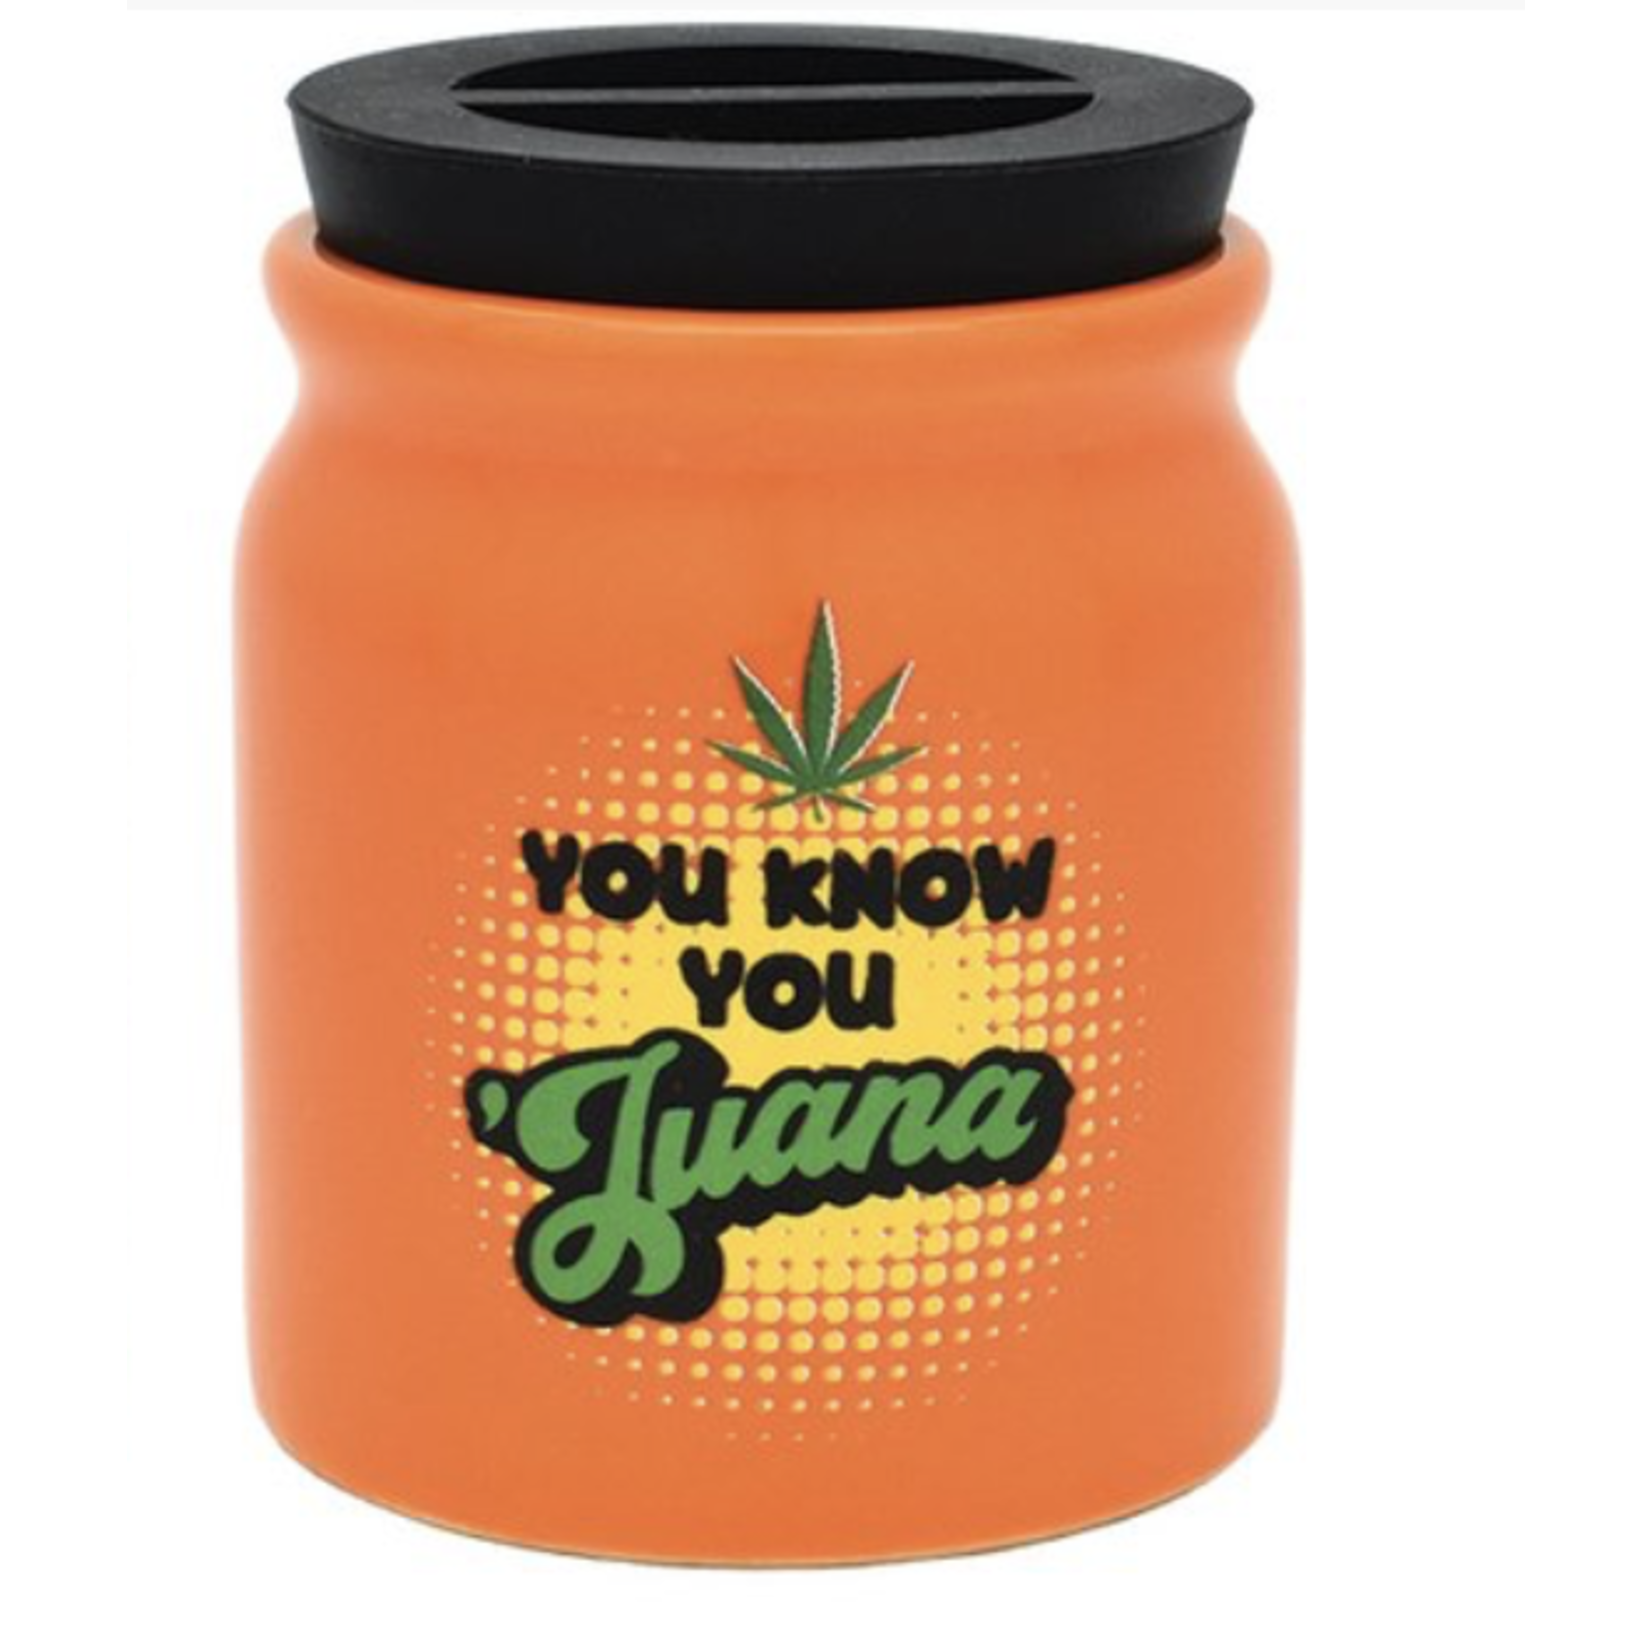 Stash Jar - You Know You Juana